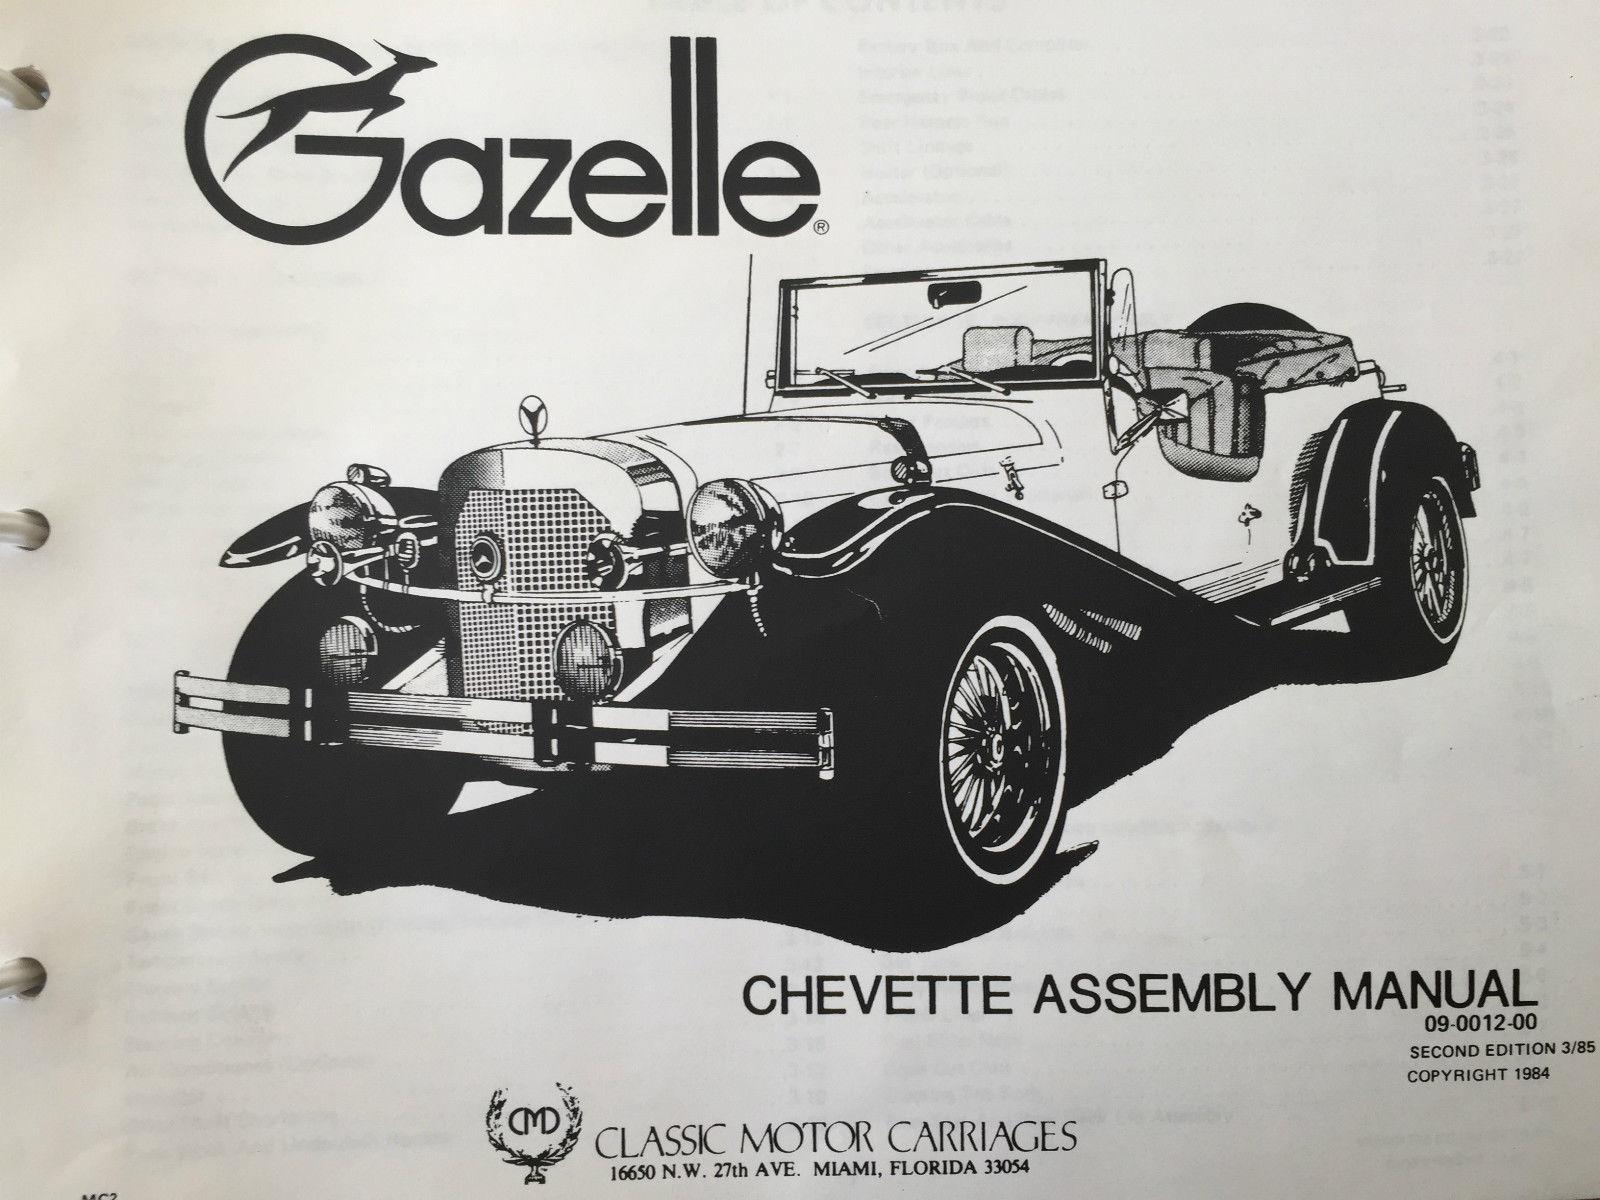 Mercedes Gazelle Kit Car Parts Electrical Schematic